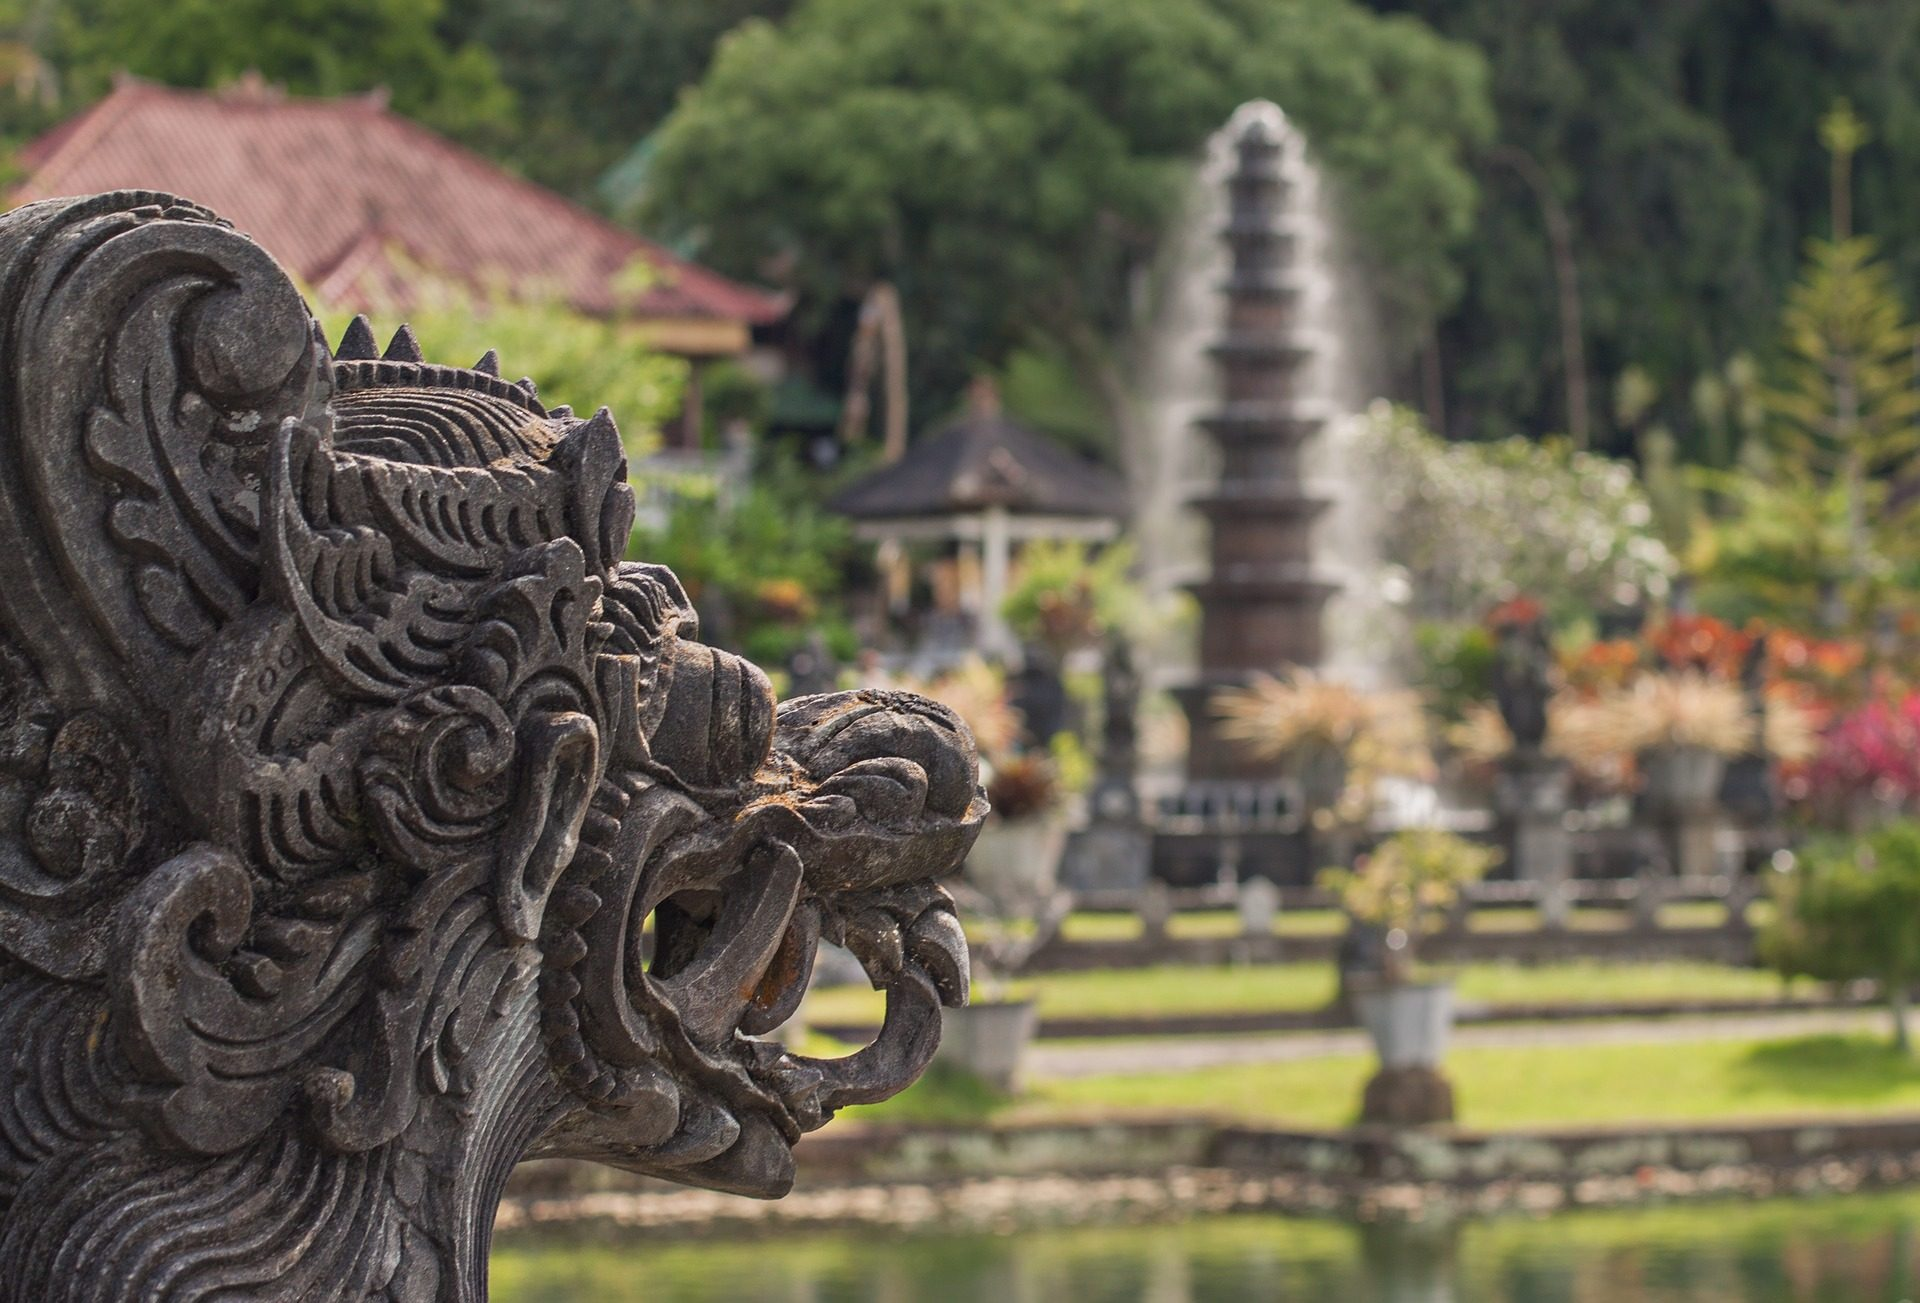 Dragón, Statua, fonte, l'acqua Palace, Bali - Sfondi HD - Professor-falken.com